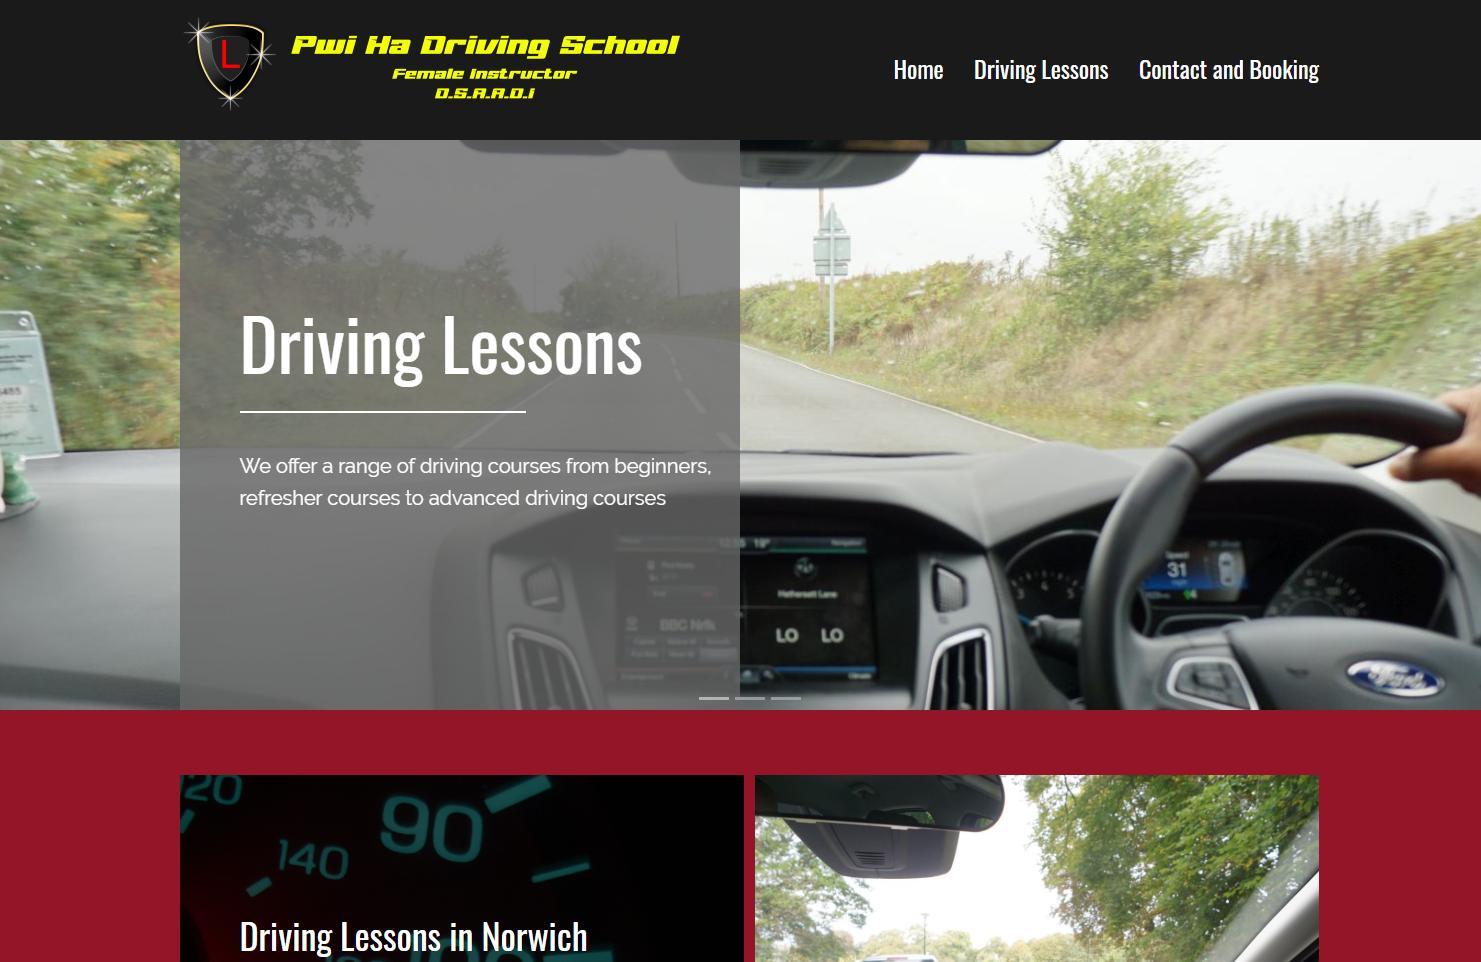 Pwi Ha's Driving School